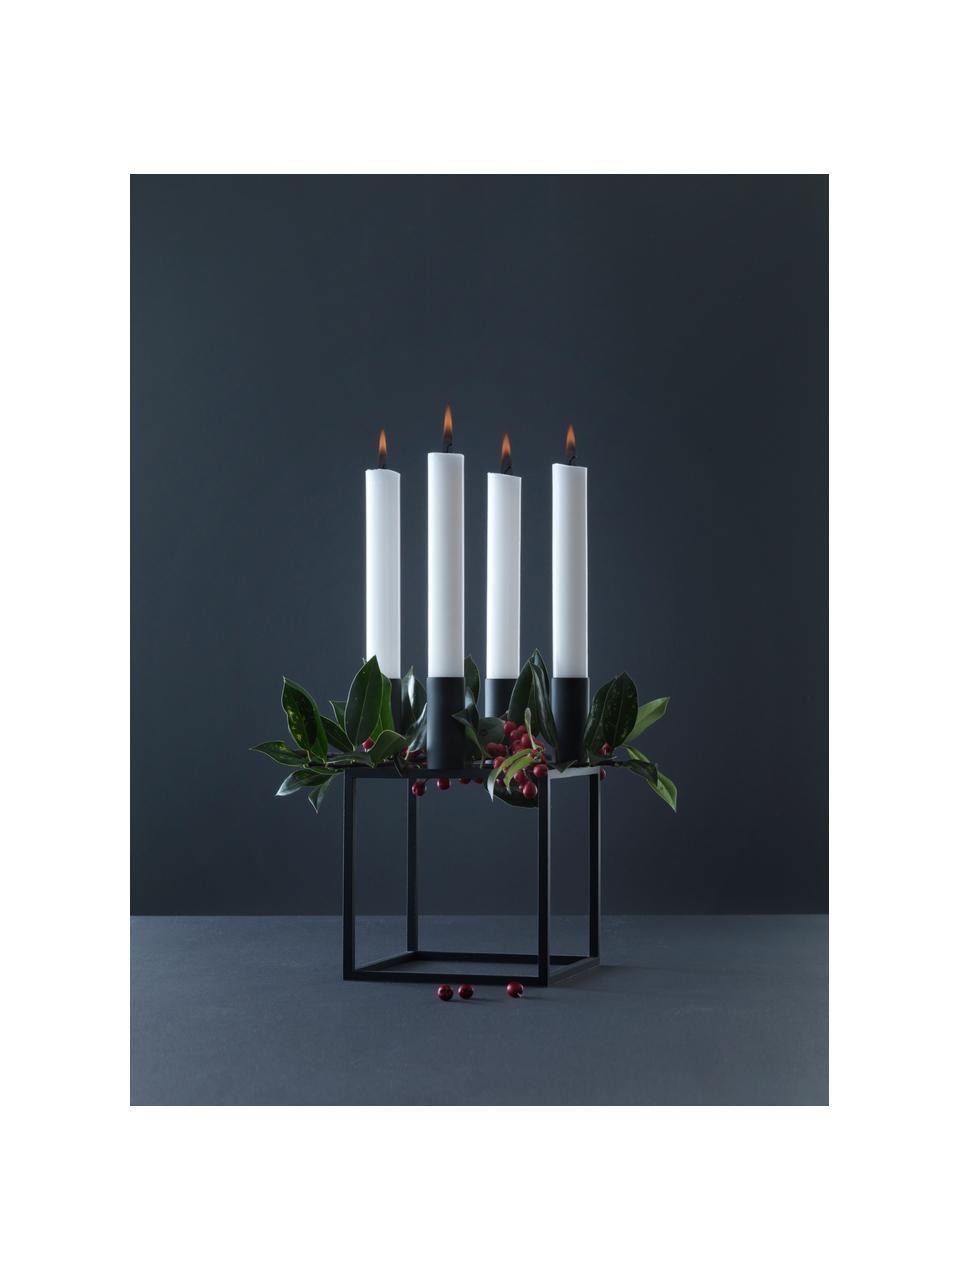 Kerzenhalter Kubus, Stahl, lackiert, Schwarz, 14 x 20 cm